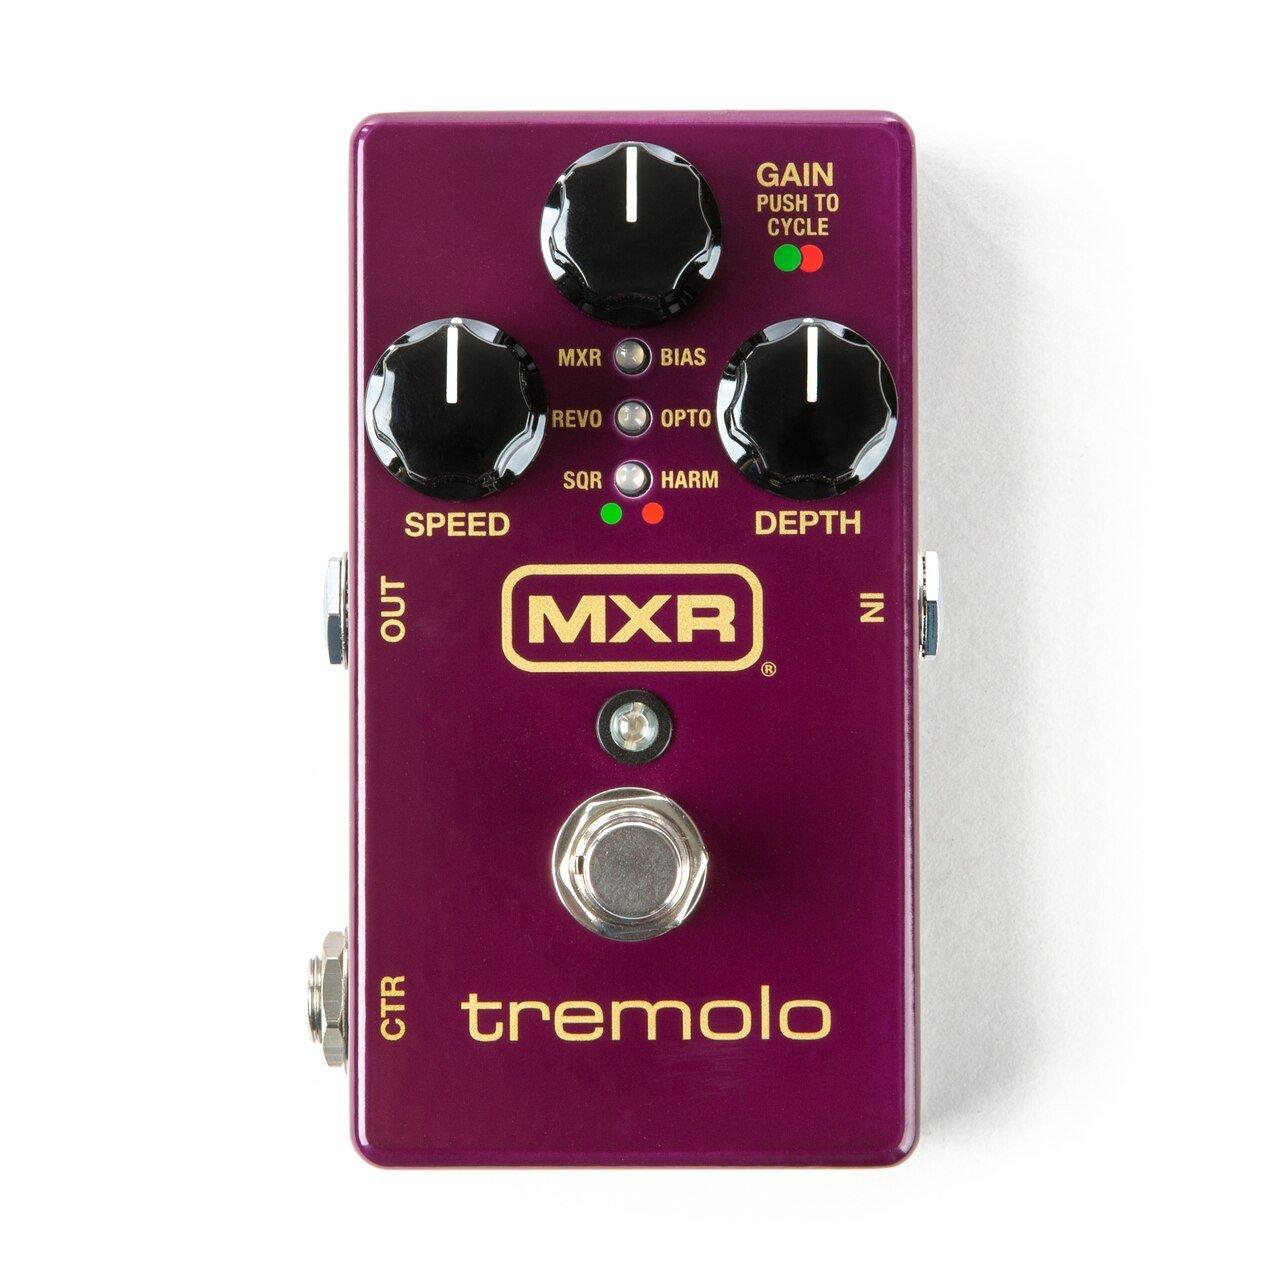 MXR Tremolo M305